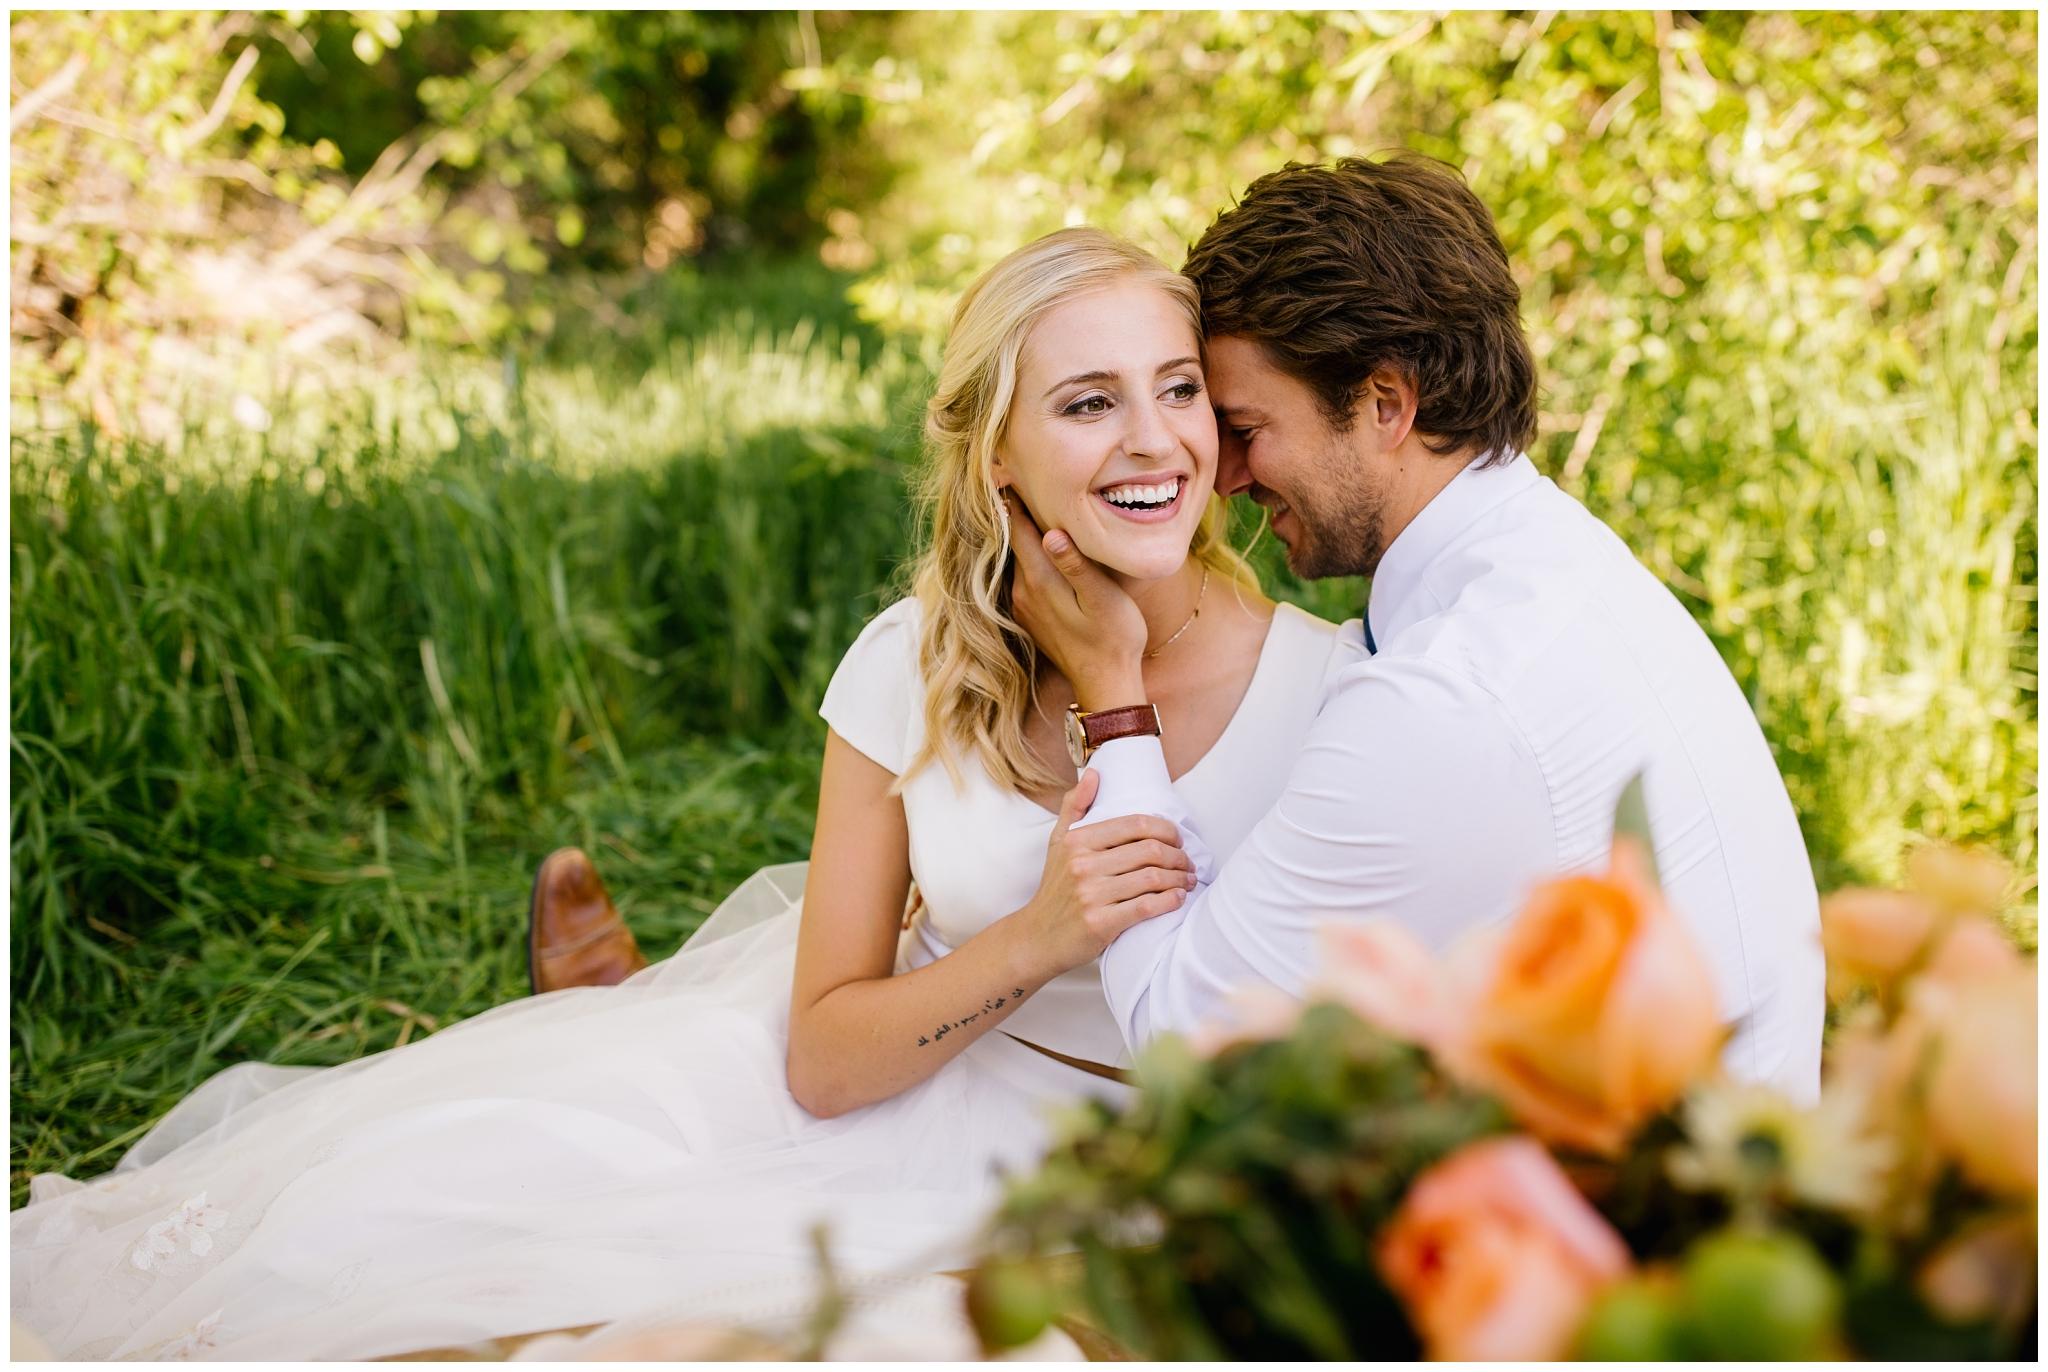 Lizzie-B-Imagery-Utah-Wedding-Photographer-Park-City-Photographer_0032.jpg